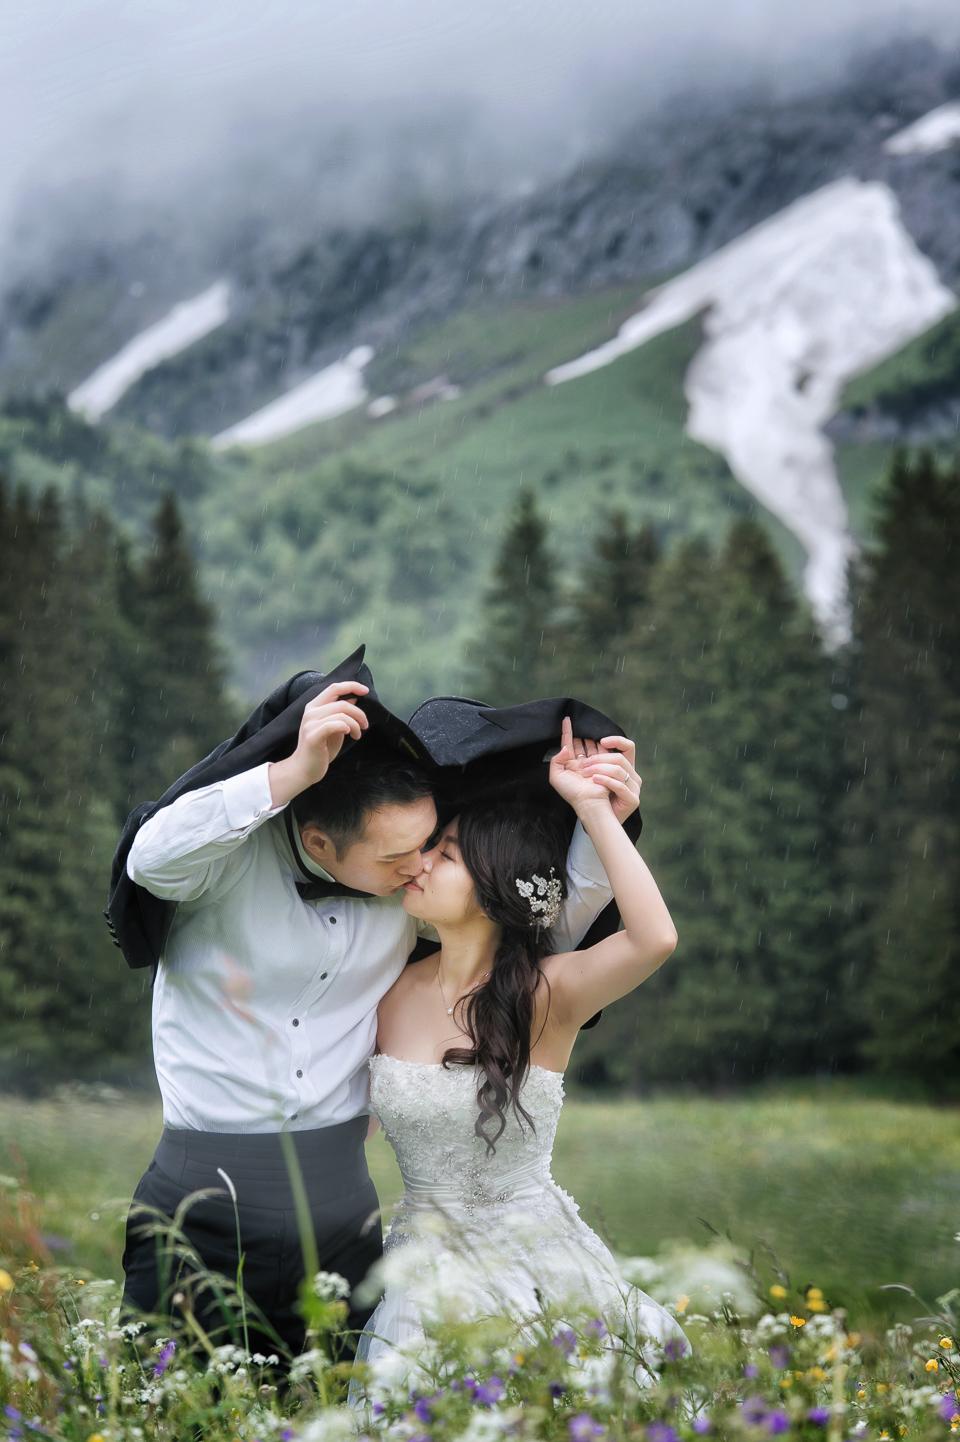 EASTERN WEDDING, Donfer Photography, 婚攝東法, 自助婚紗, 婚紗影像, 海外婚紗, 瑞士婚紗